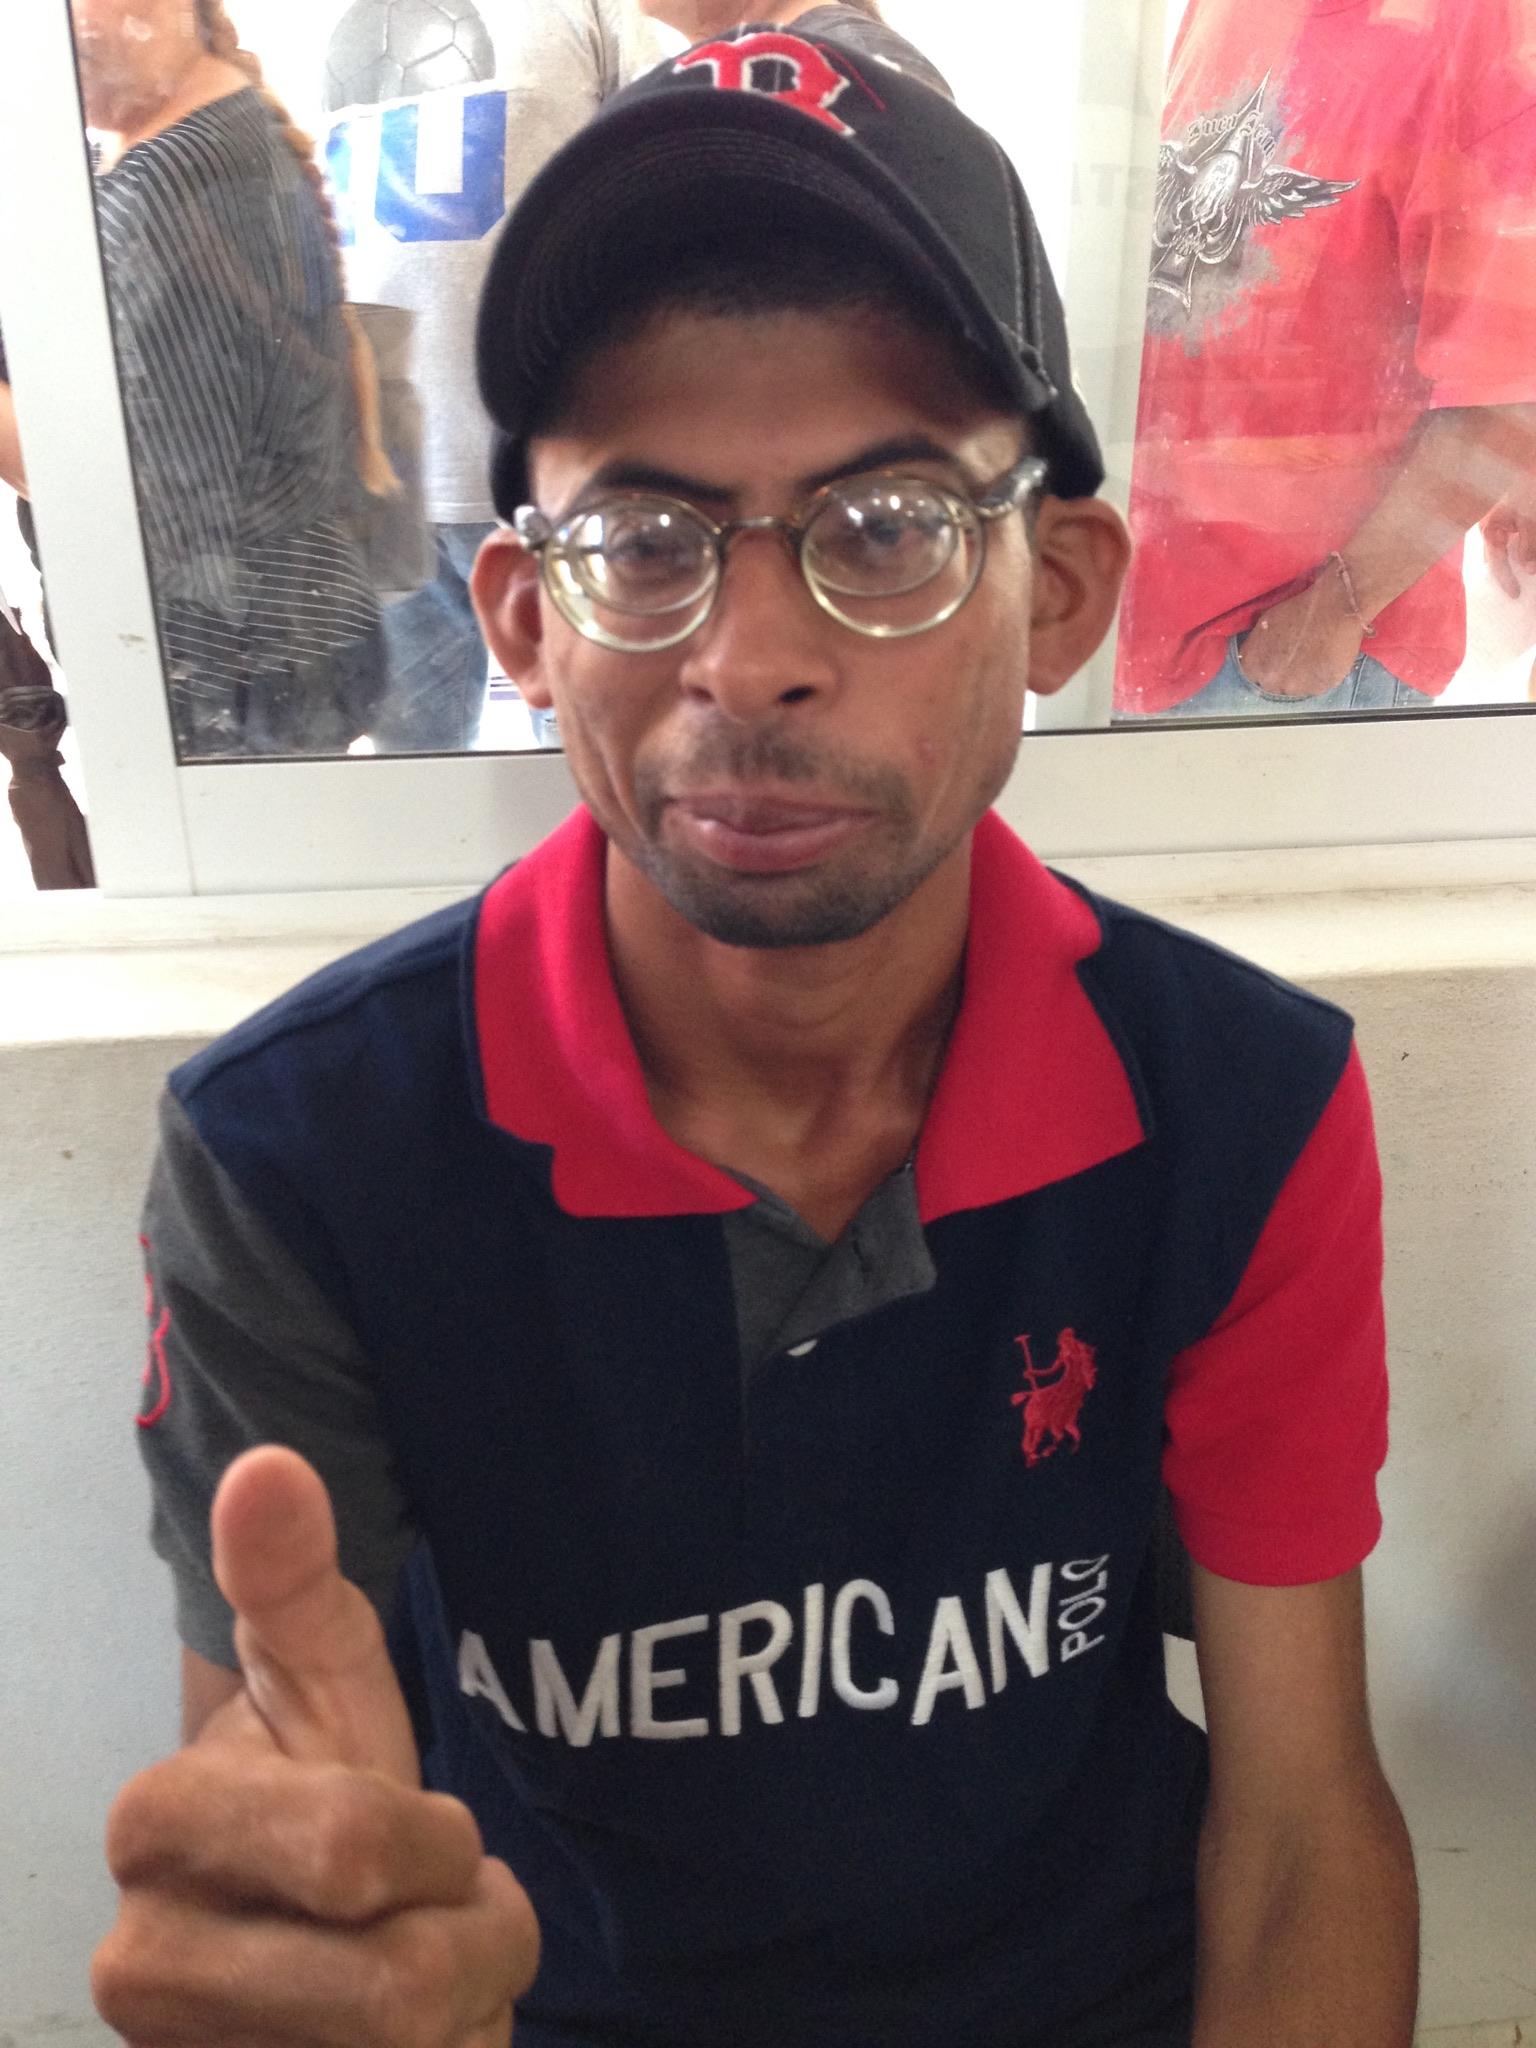 Man in cap and glasses